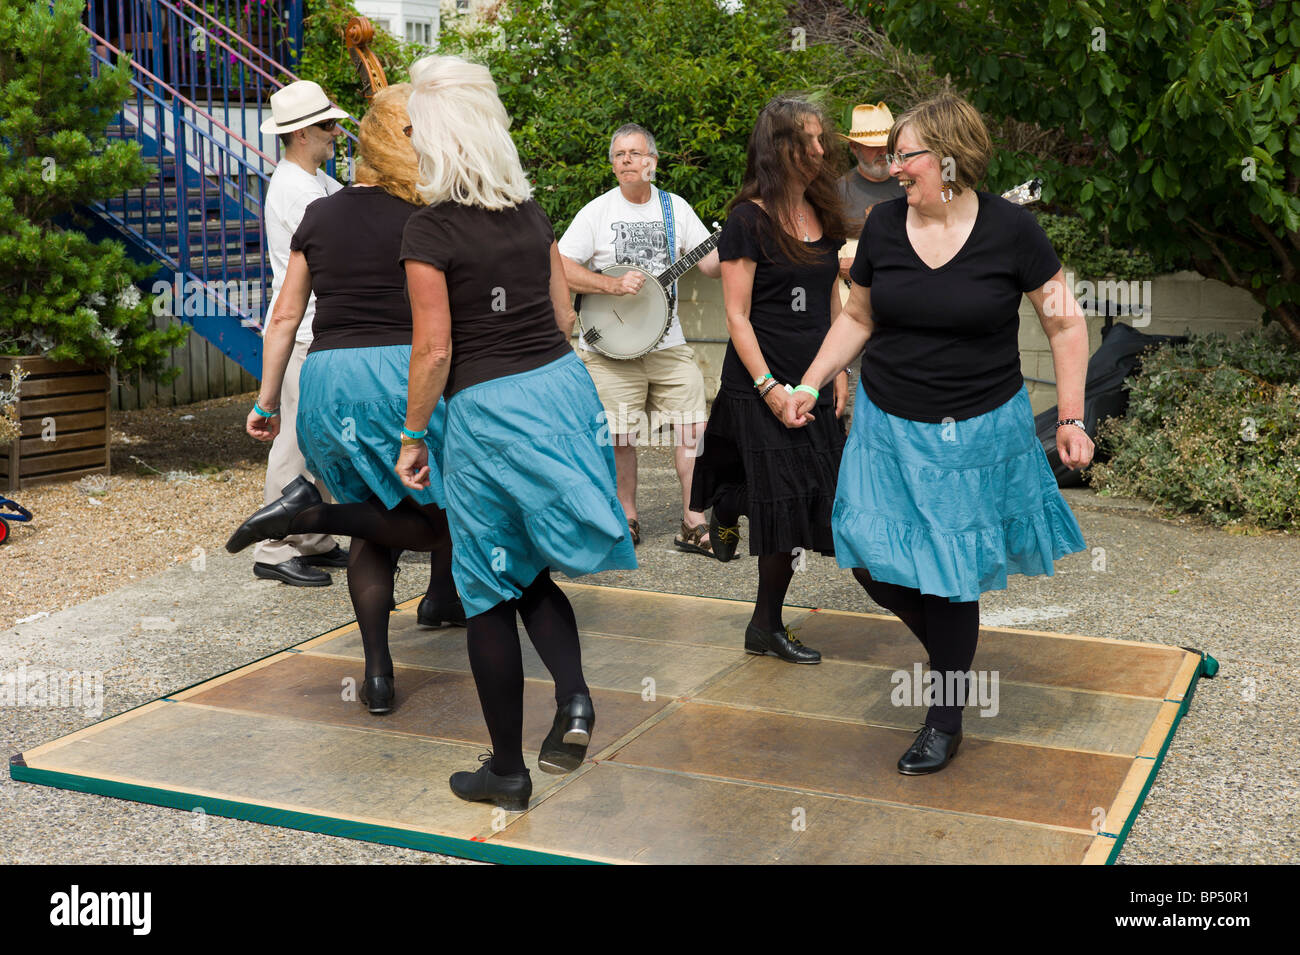 Folk Dancers at the Broadstairs Folk Festival - Stock Image